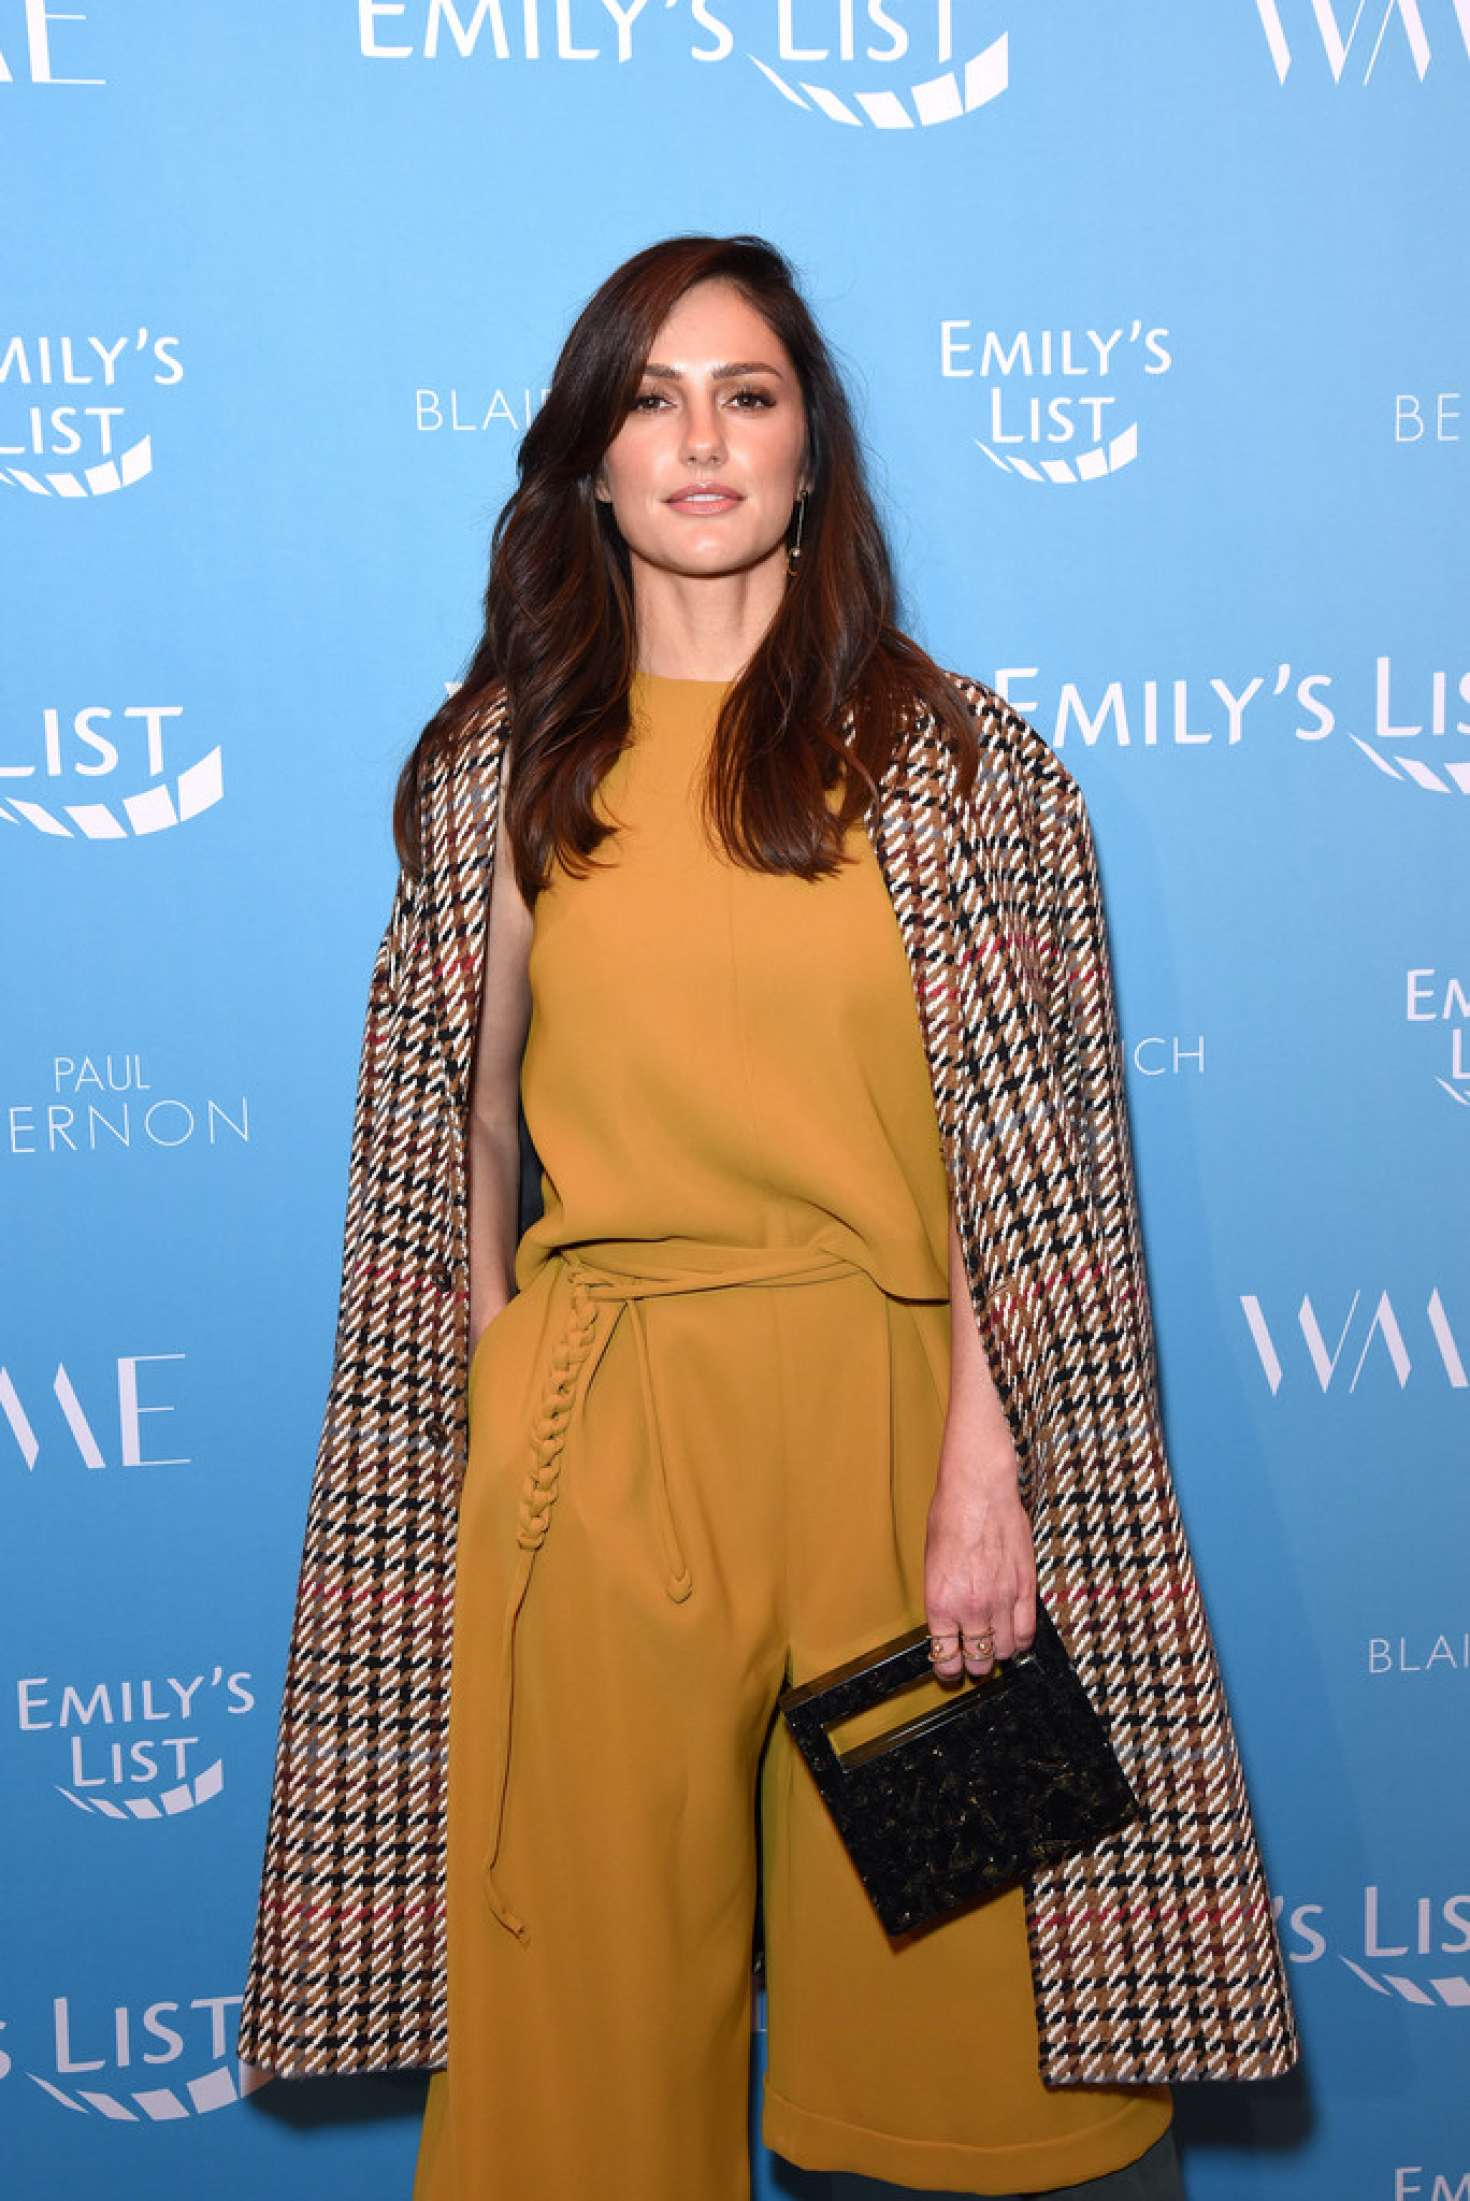 Minka Kelly - EMILY's List 2nd Annual Pre-Oscars Event in Los Angeles